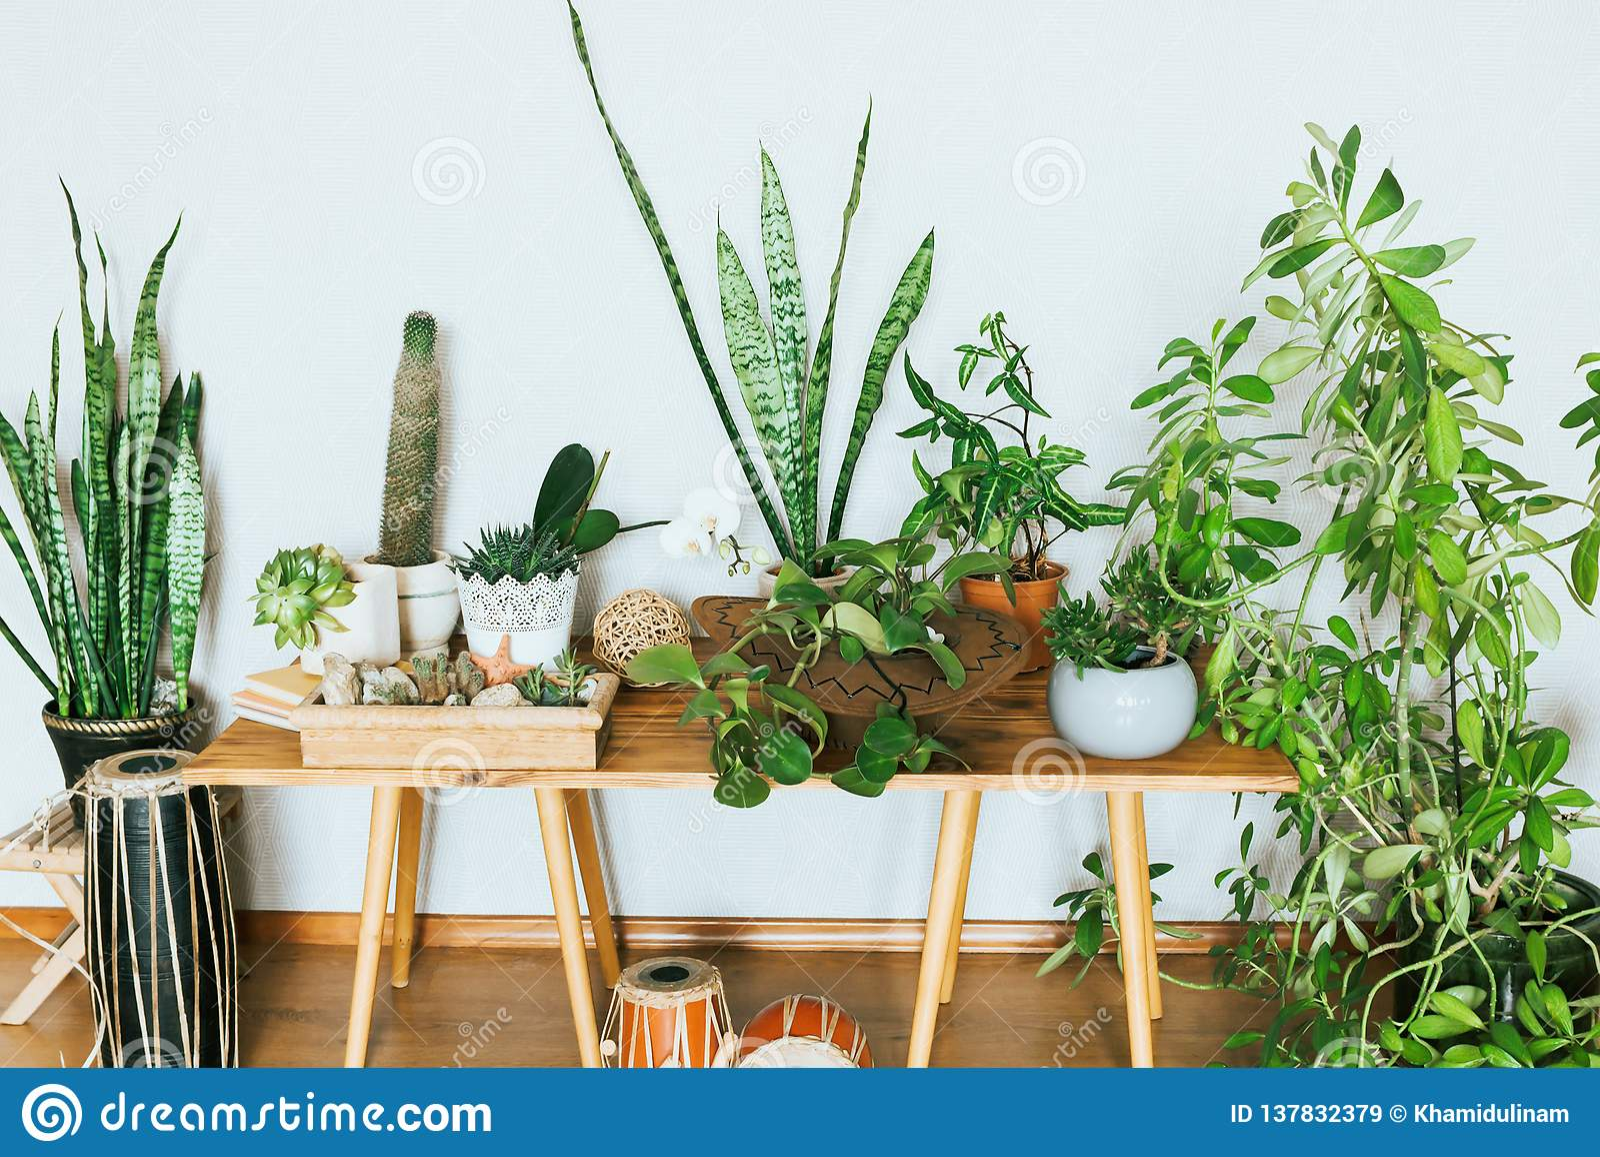 Plants in Pots. Indoor Plants in a Modern Cozy Interior. Stock ...